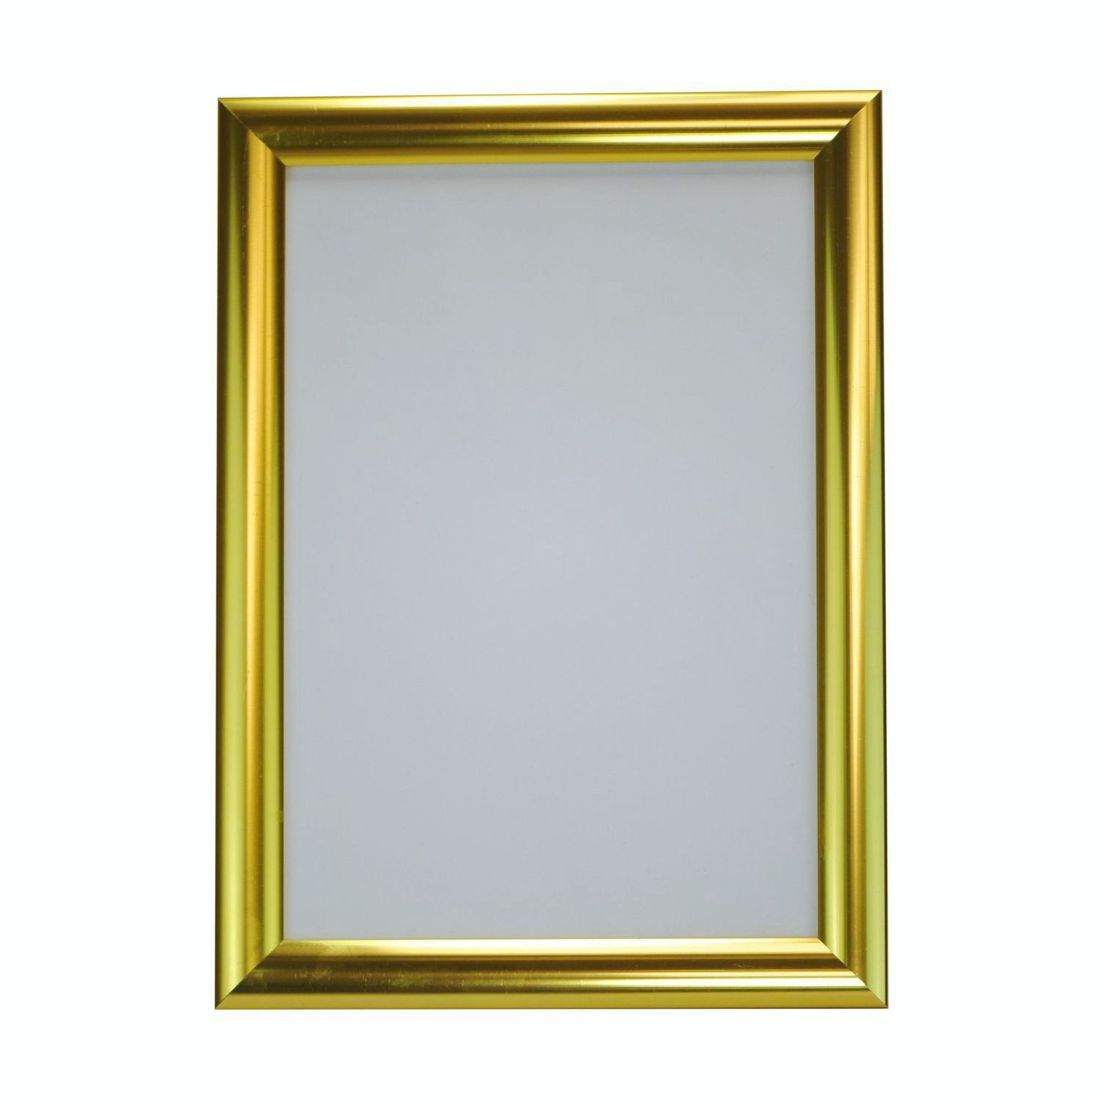 34c9b1e9ac4 Gold colour snap frames